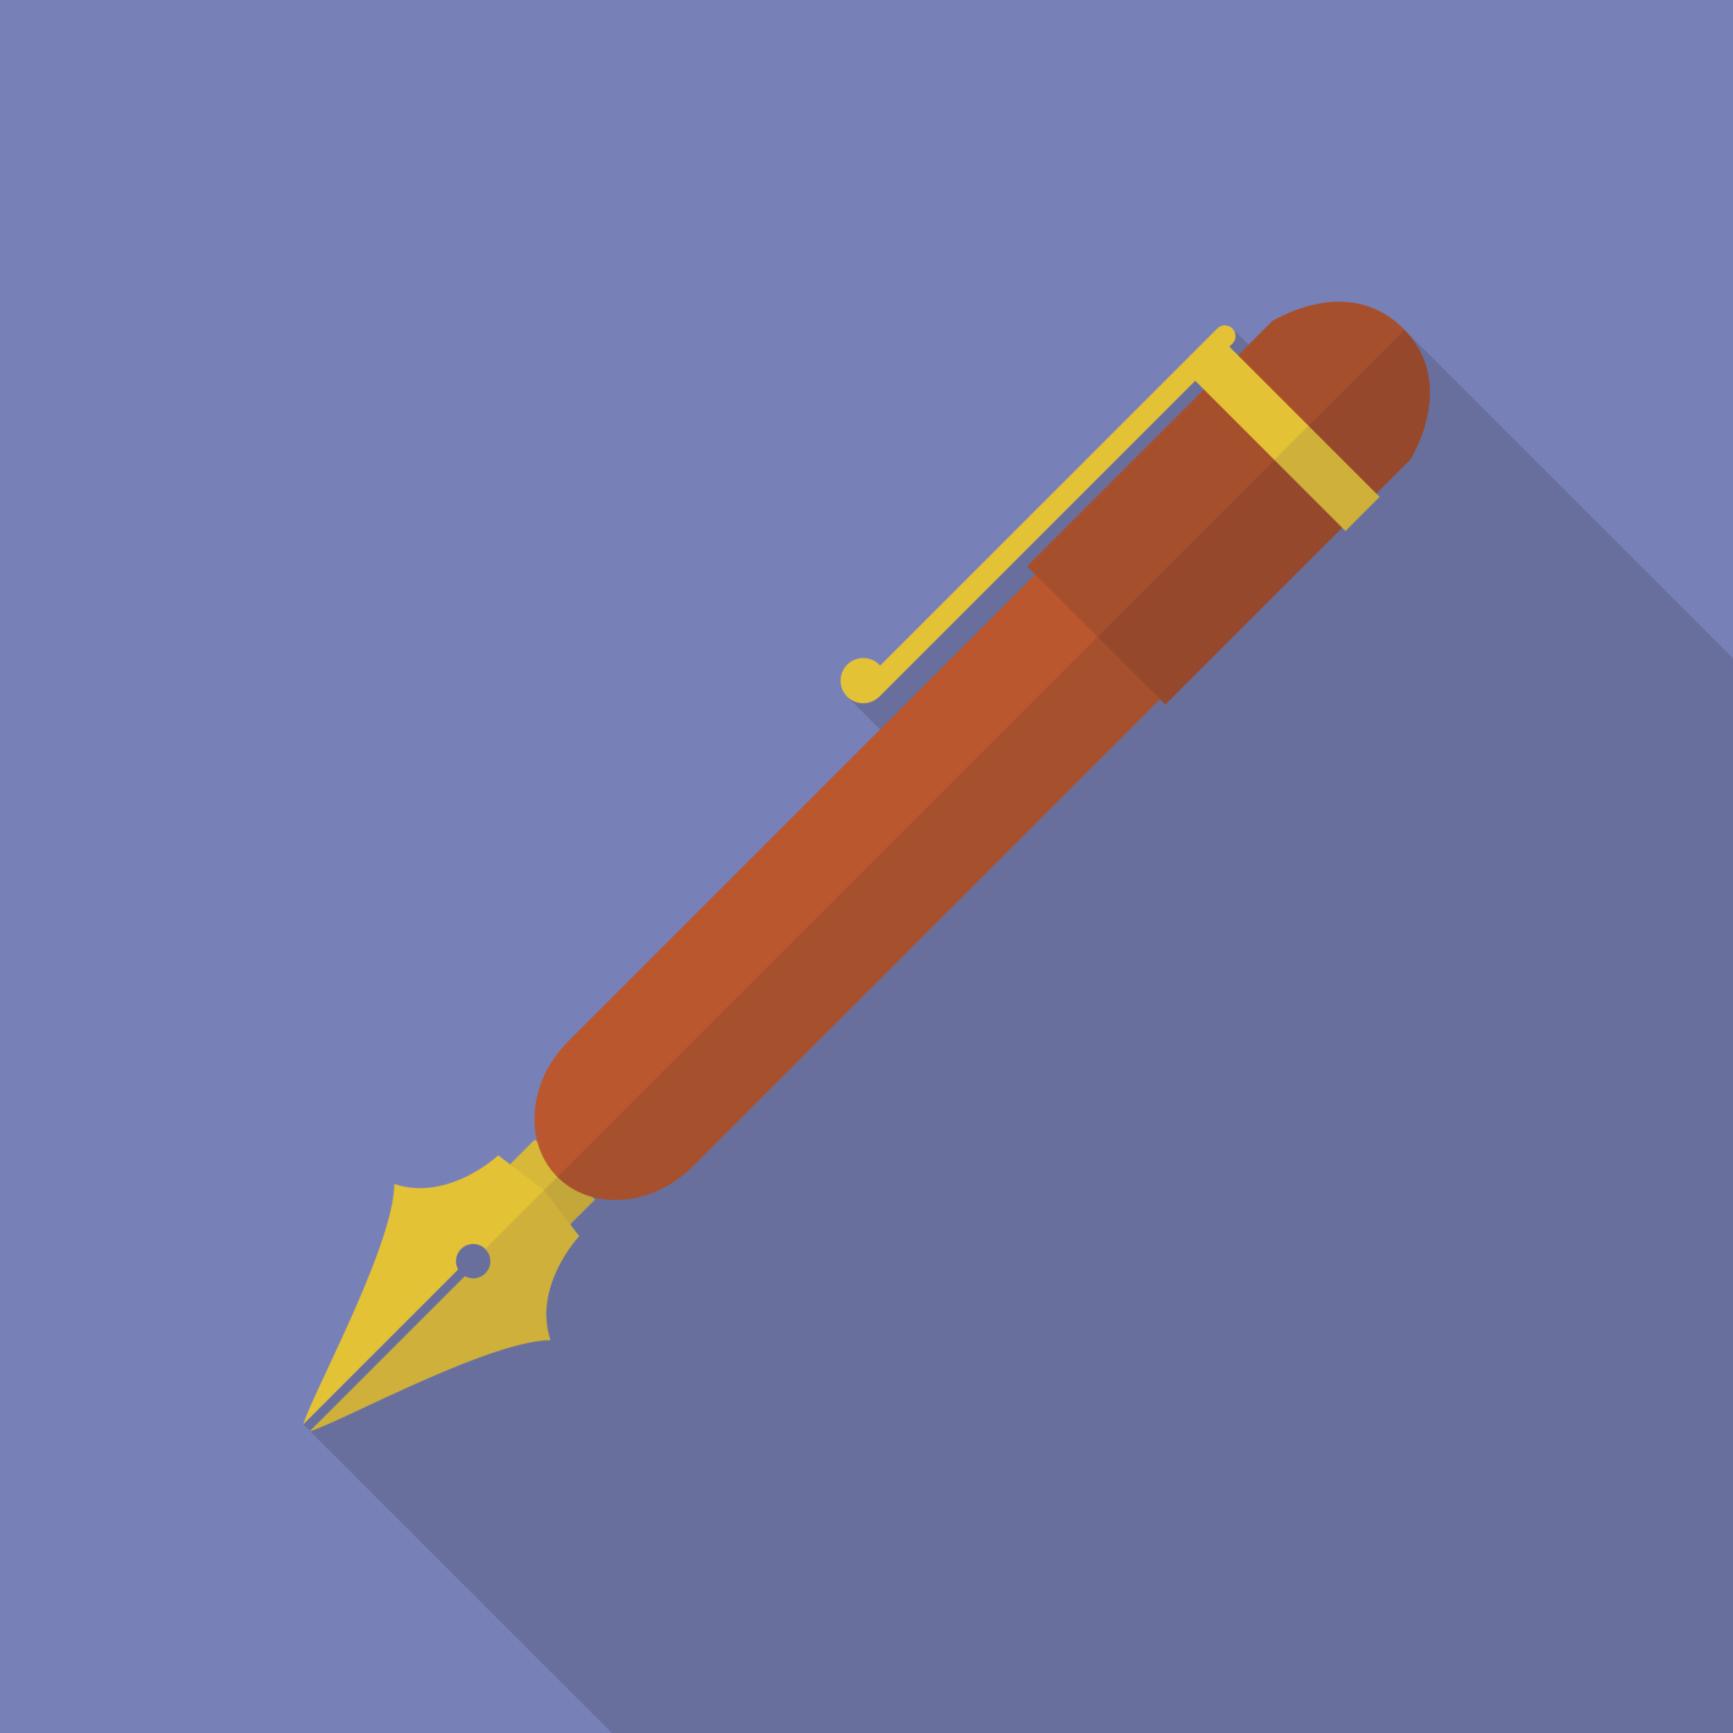 stylo plume 2